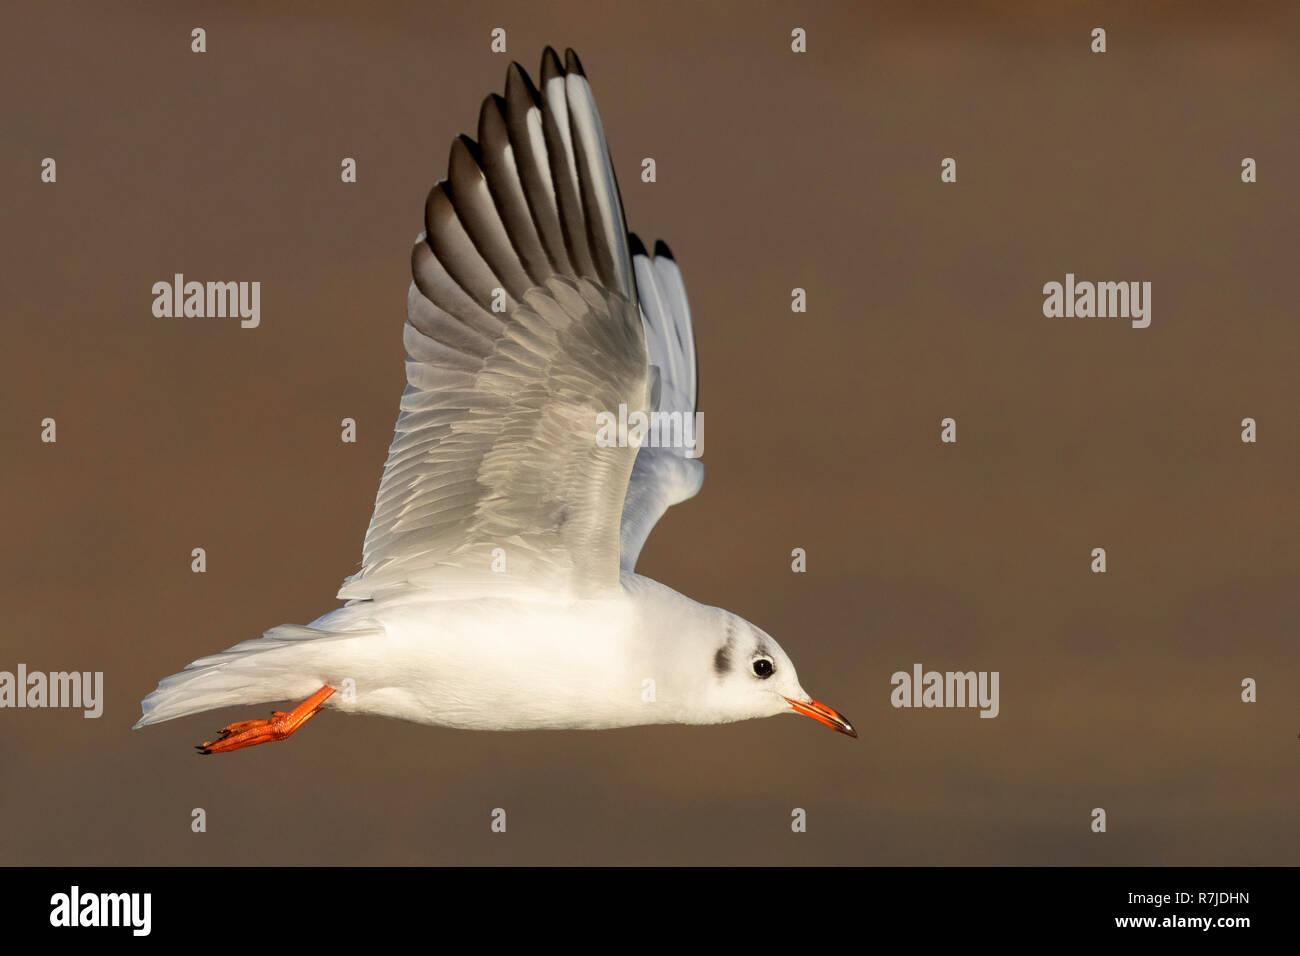 Black-headed Gull (Chroicocephalus ridibundus), side view of an adult in winter plumage in flight Stock Photo